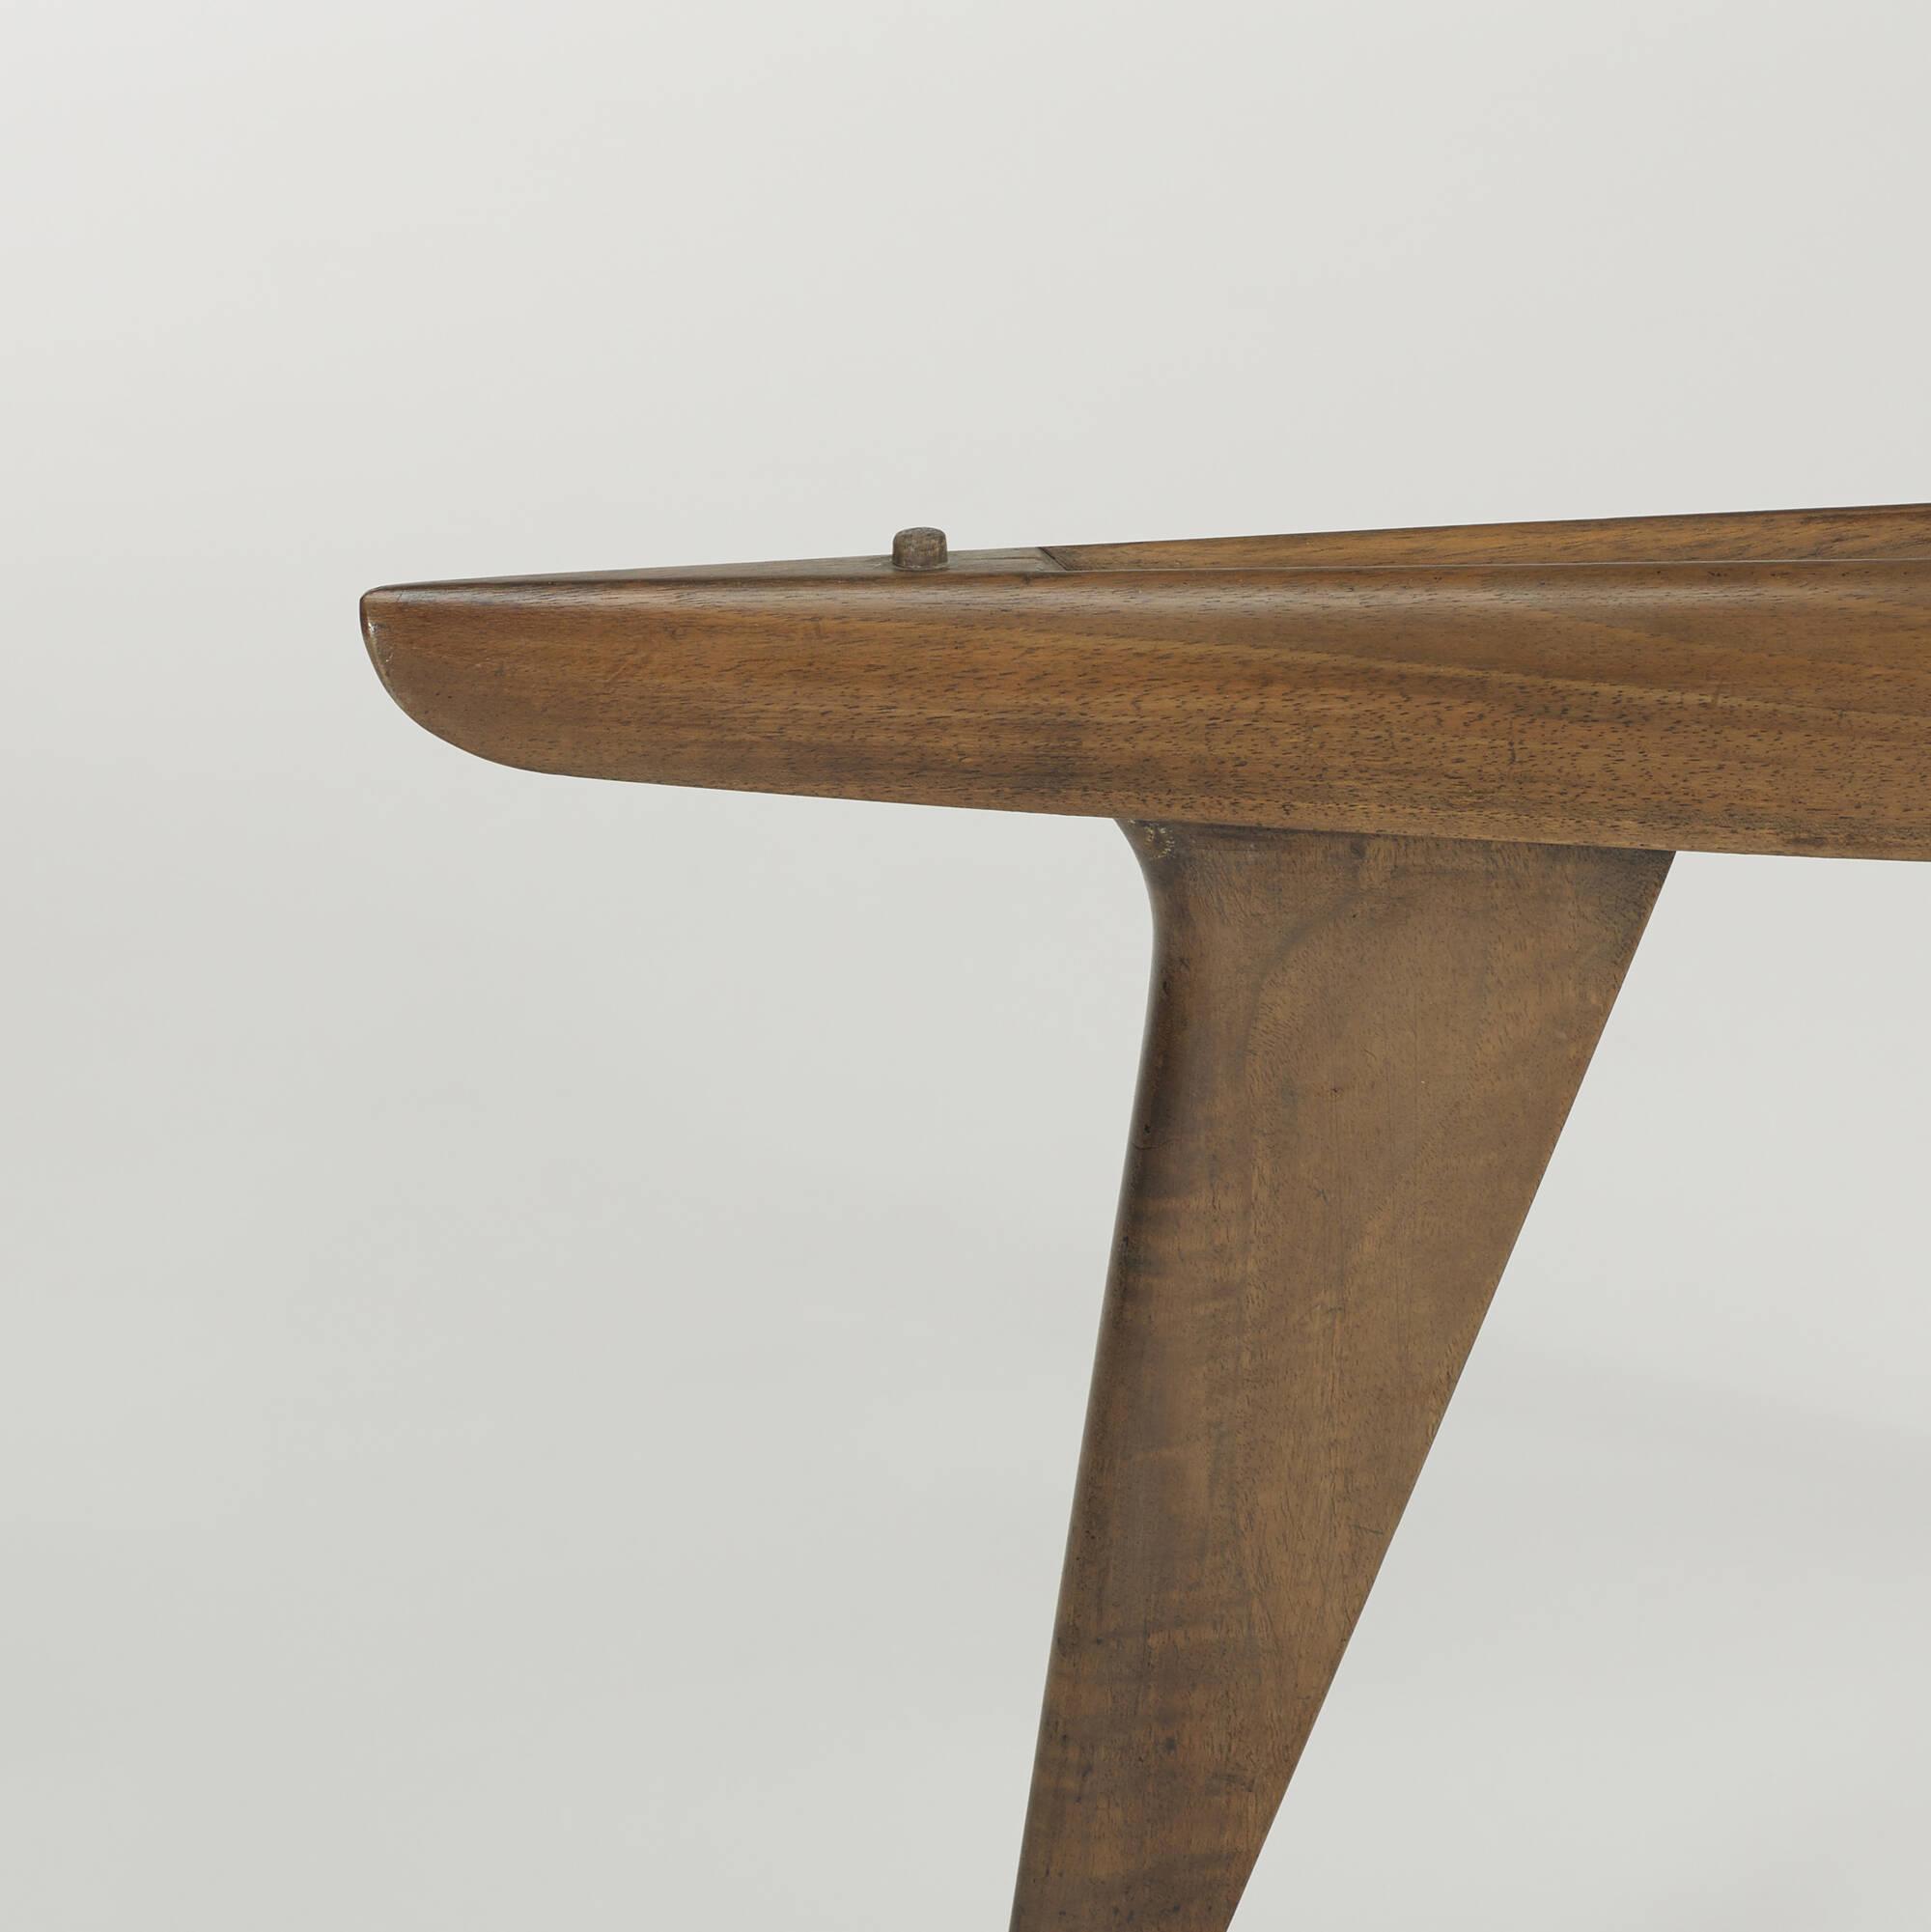 239 Gio Ponti coffee table Important Design 11 December 2014